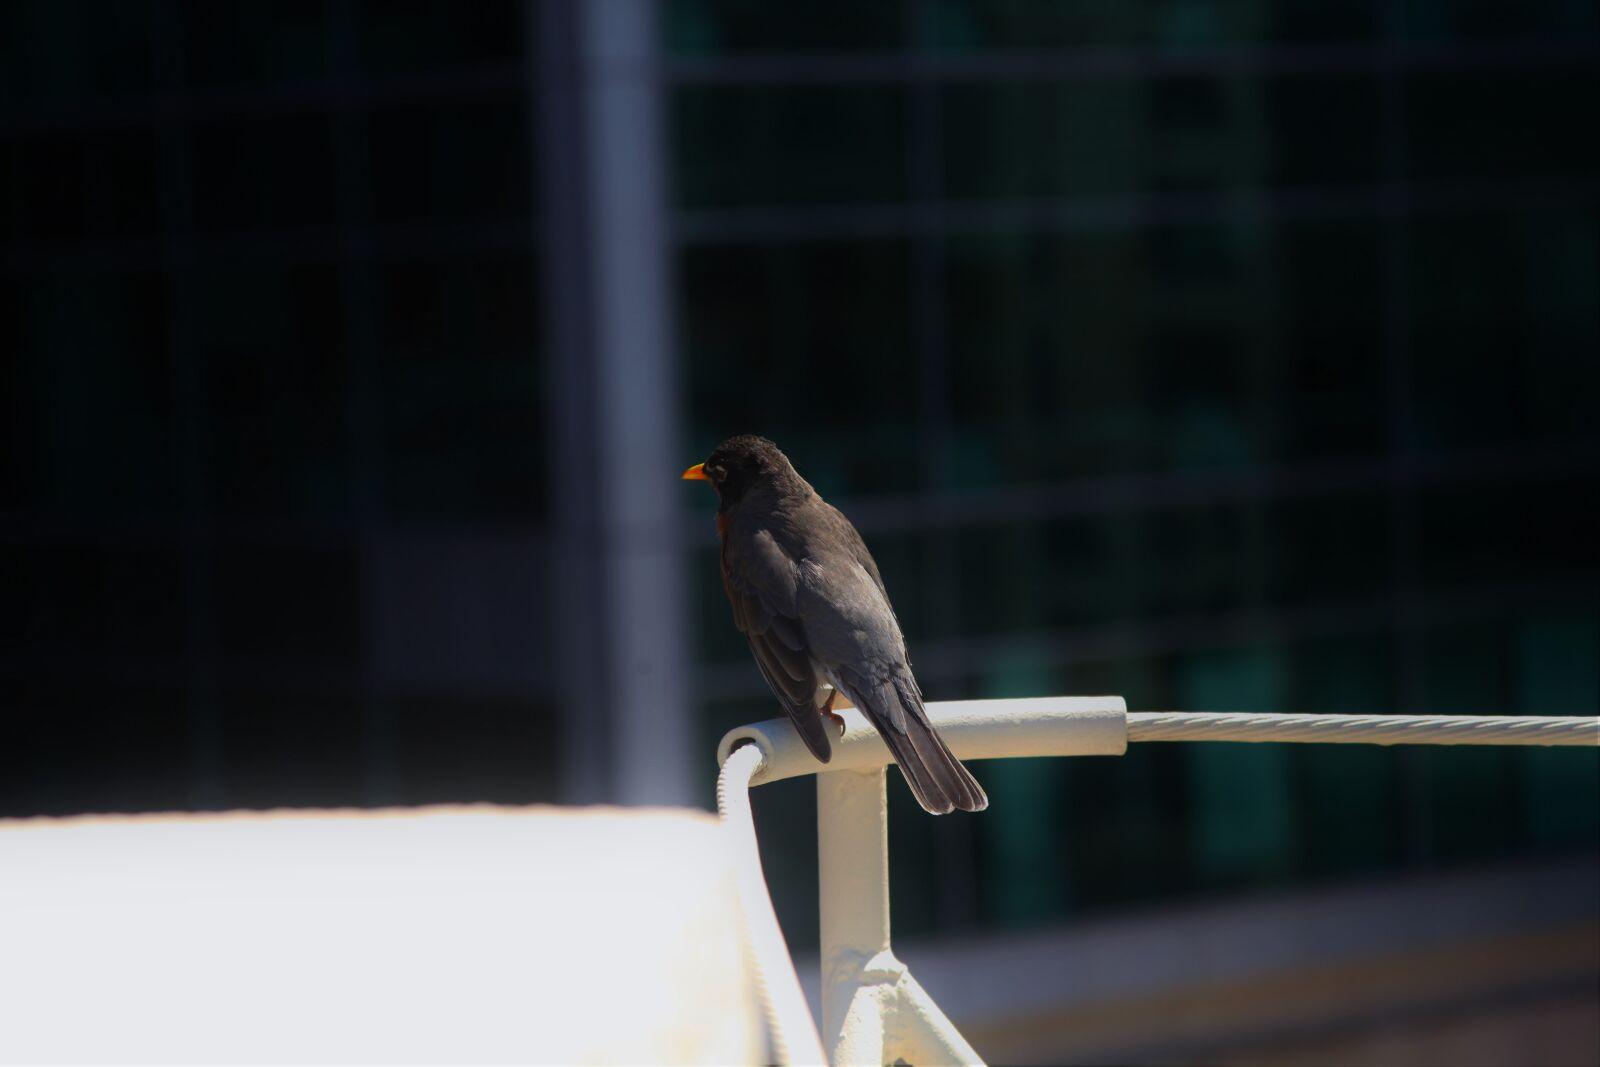 bird, city, wildlife, Canon EOS 5D MARK II, Canon EF 28-135mm f/3.5-5.6 IS